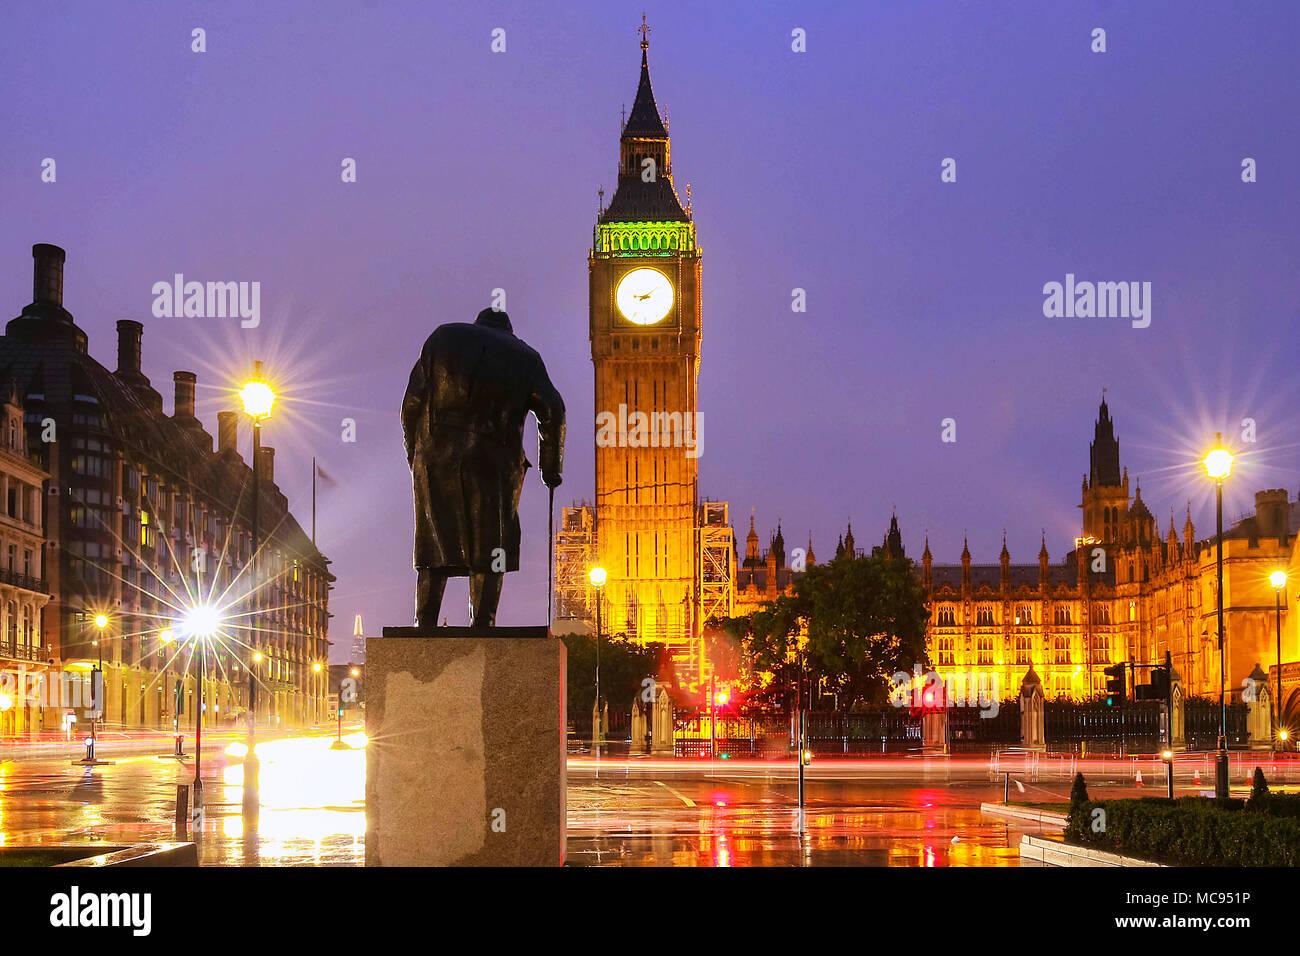 La tour de Big Ben à rainy night, London, Royaume-Uni. Photo Stock